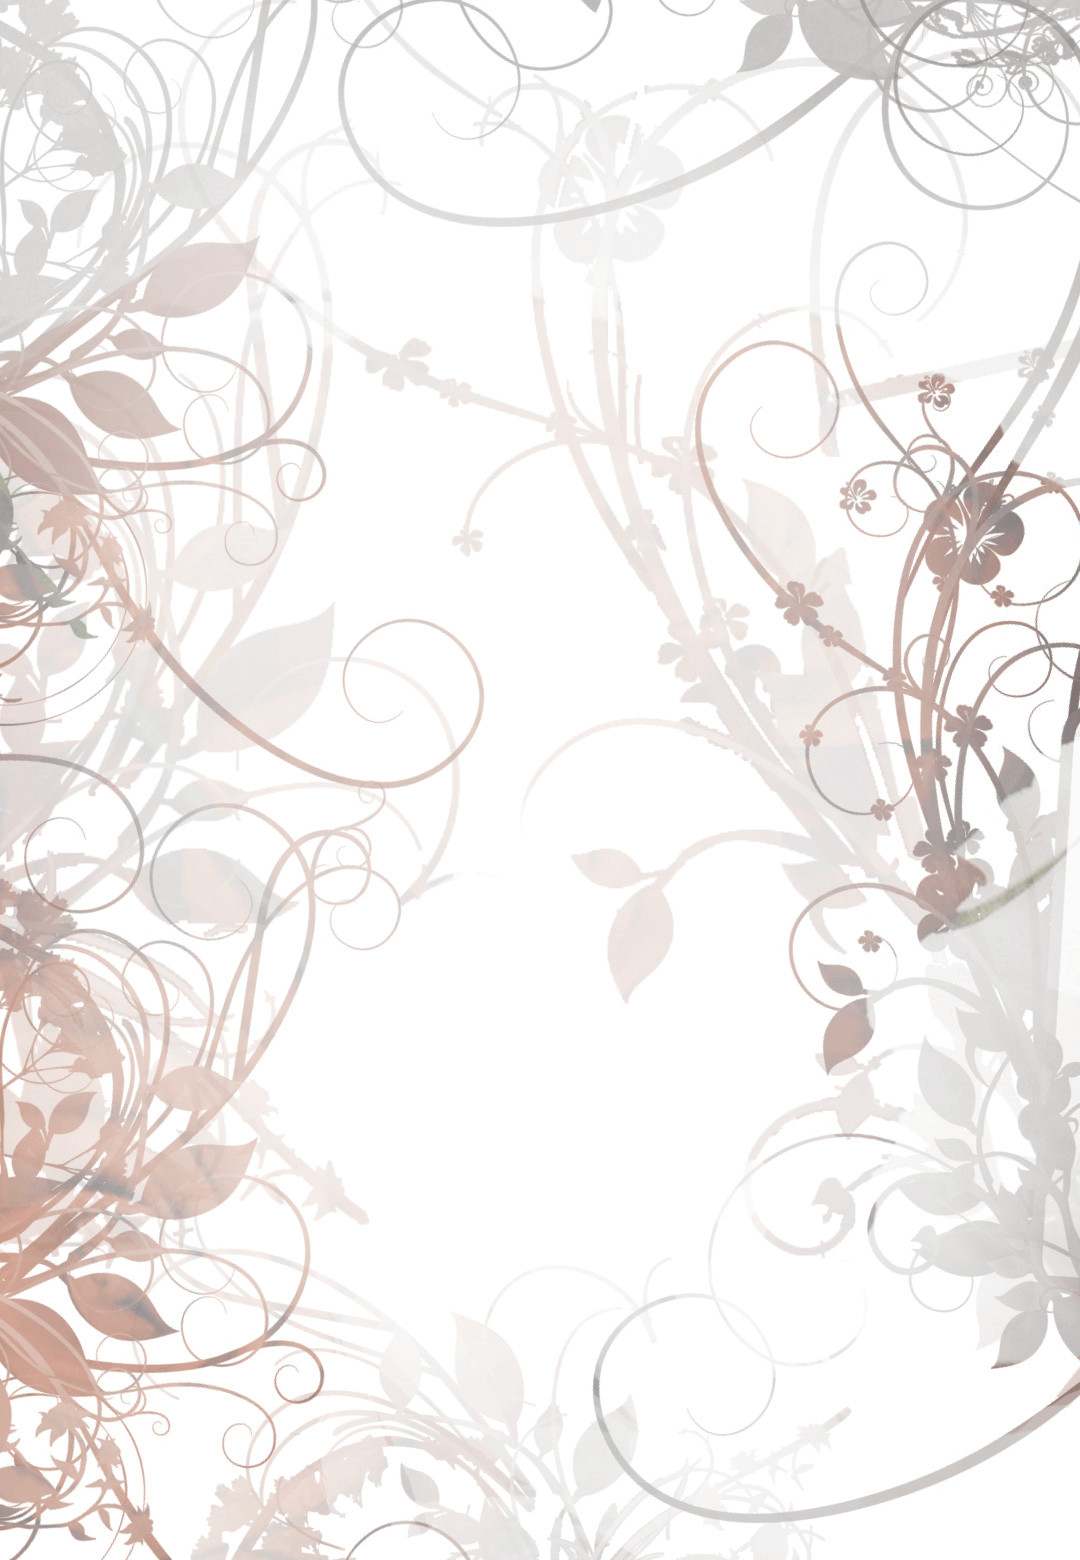 Free Bridal Shower Templates Floral Bridal Shower Free Printable Bridal Shower